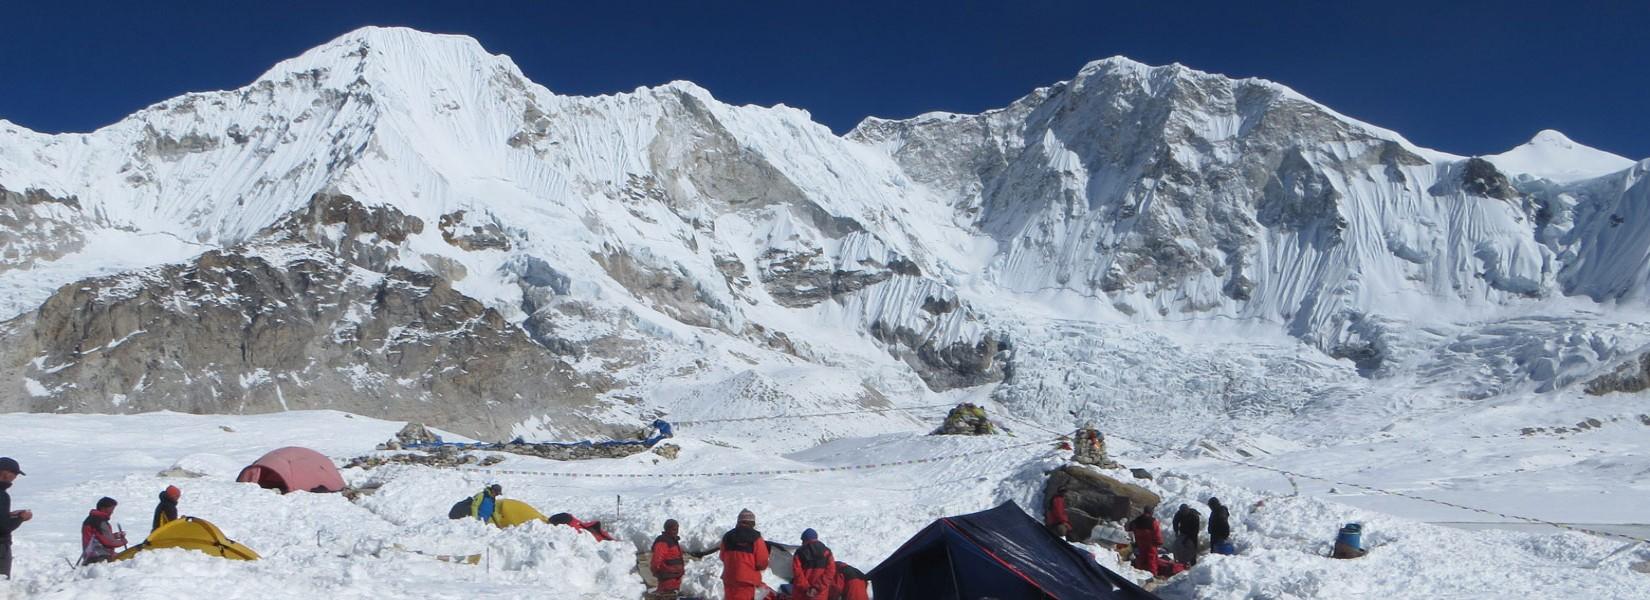 Singuchuli Peak Climbing